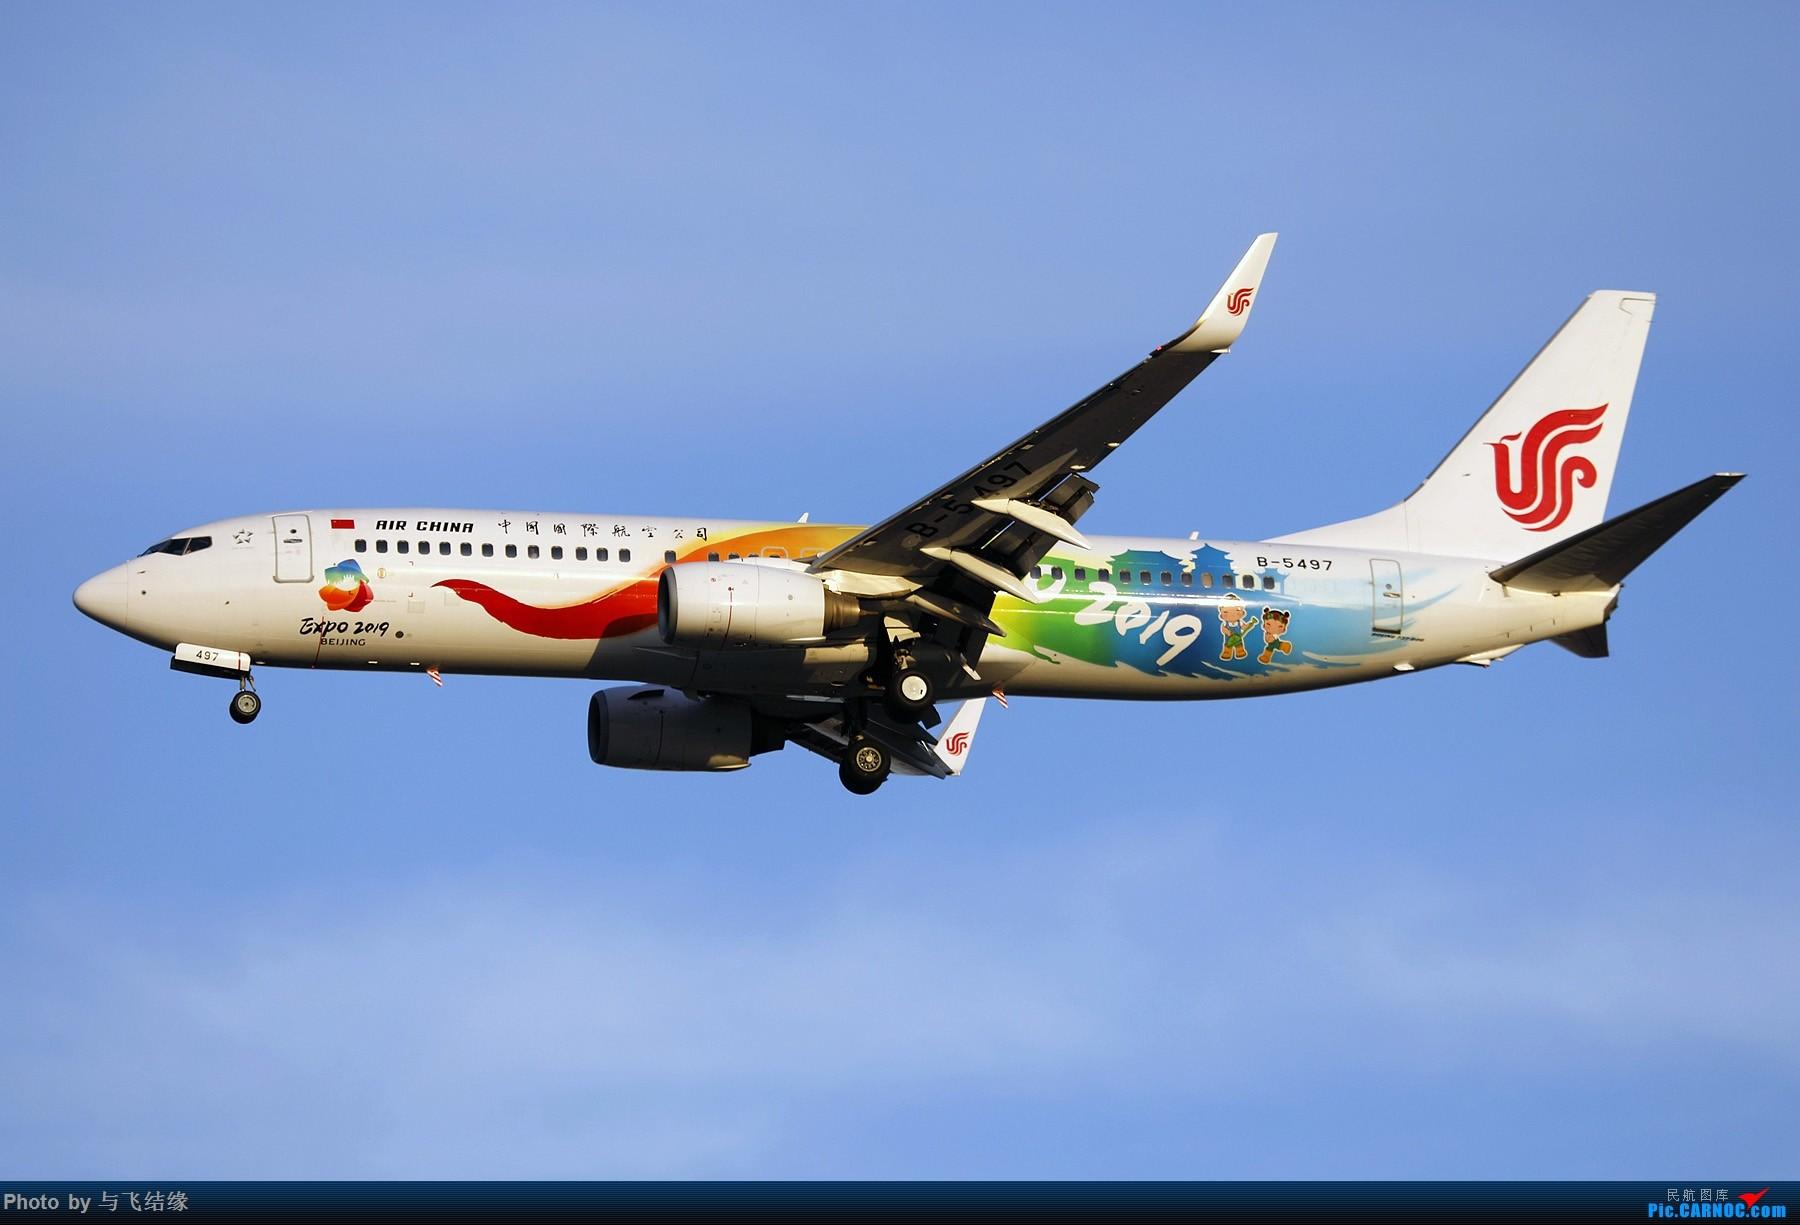 Re:[原创]以色列航空波音777-200、加拿大航空波音77W新装、国航最新空客350-900. BOEING 737-800 B-5497 中国北京首都国际机场